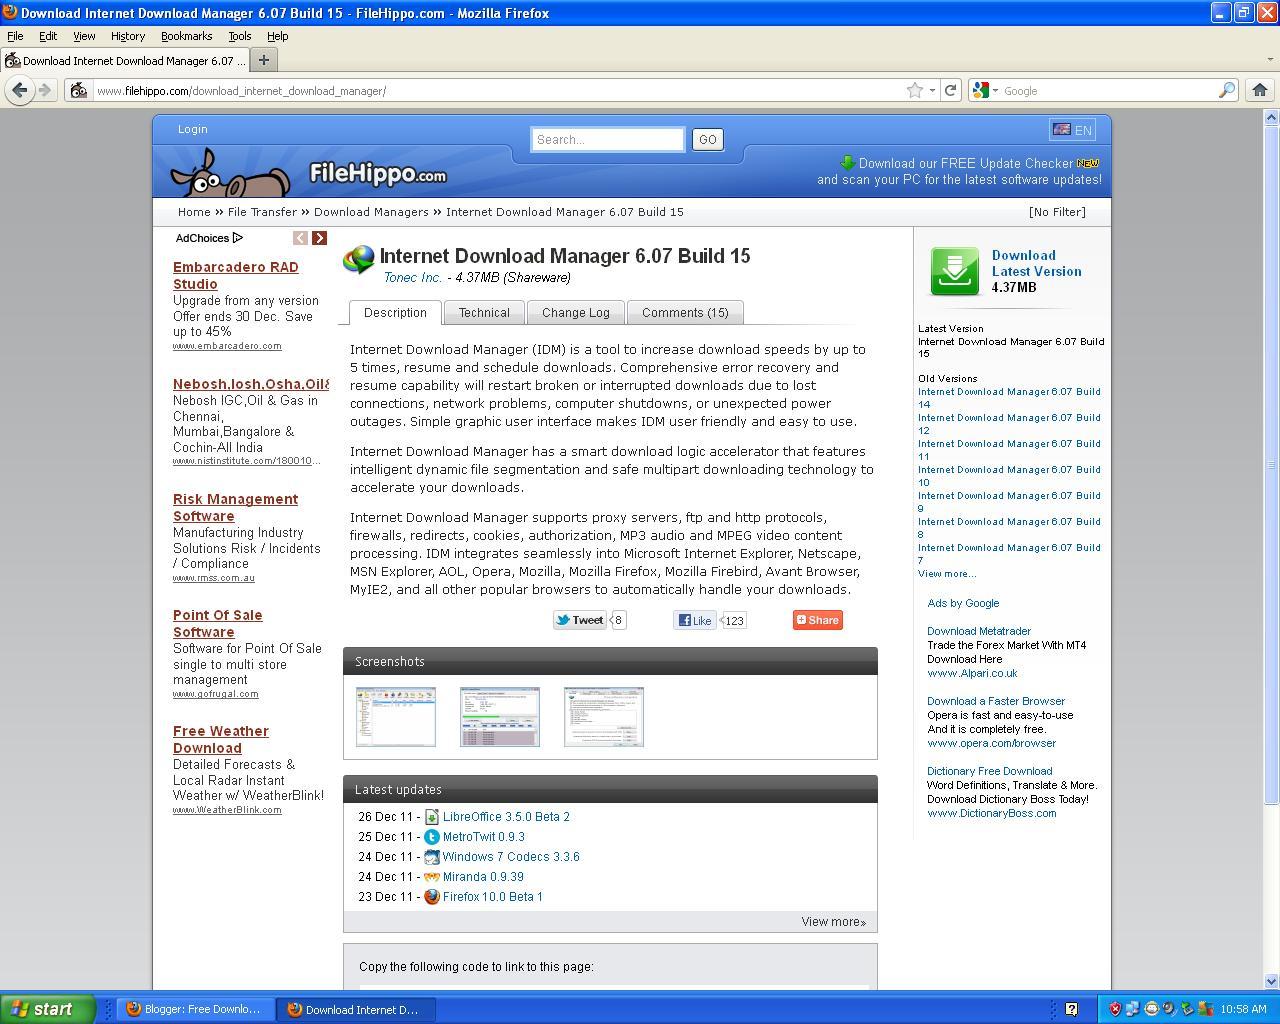 microsoft office 2013 64 bit filehippo